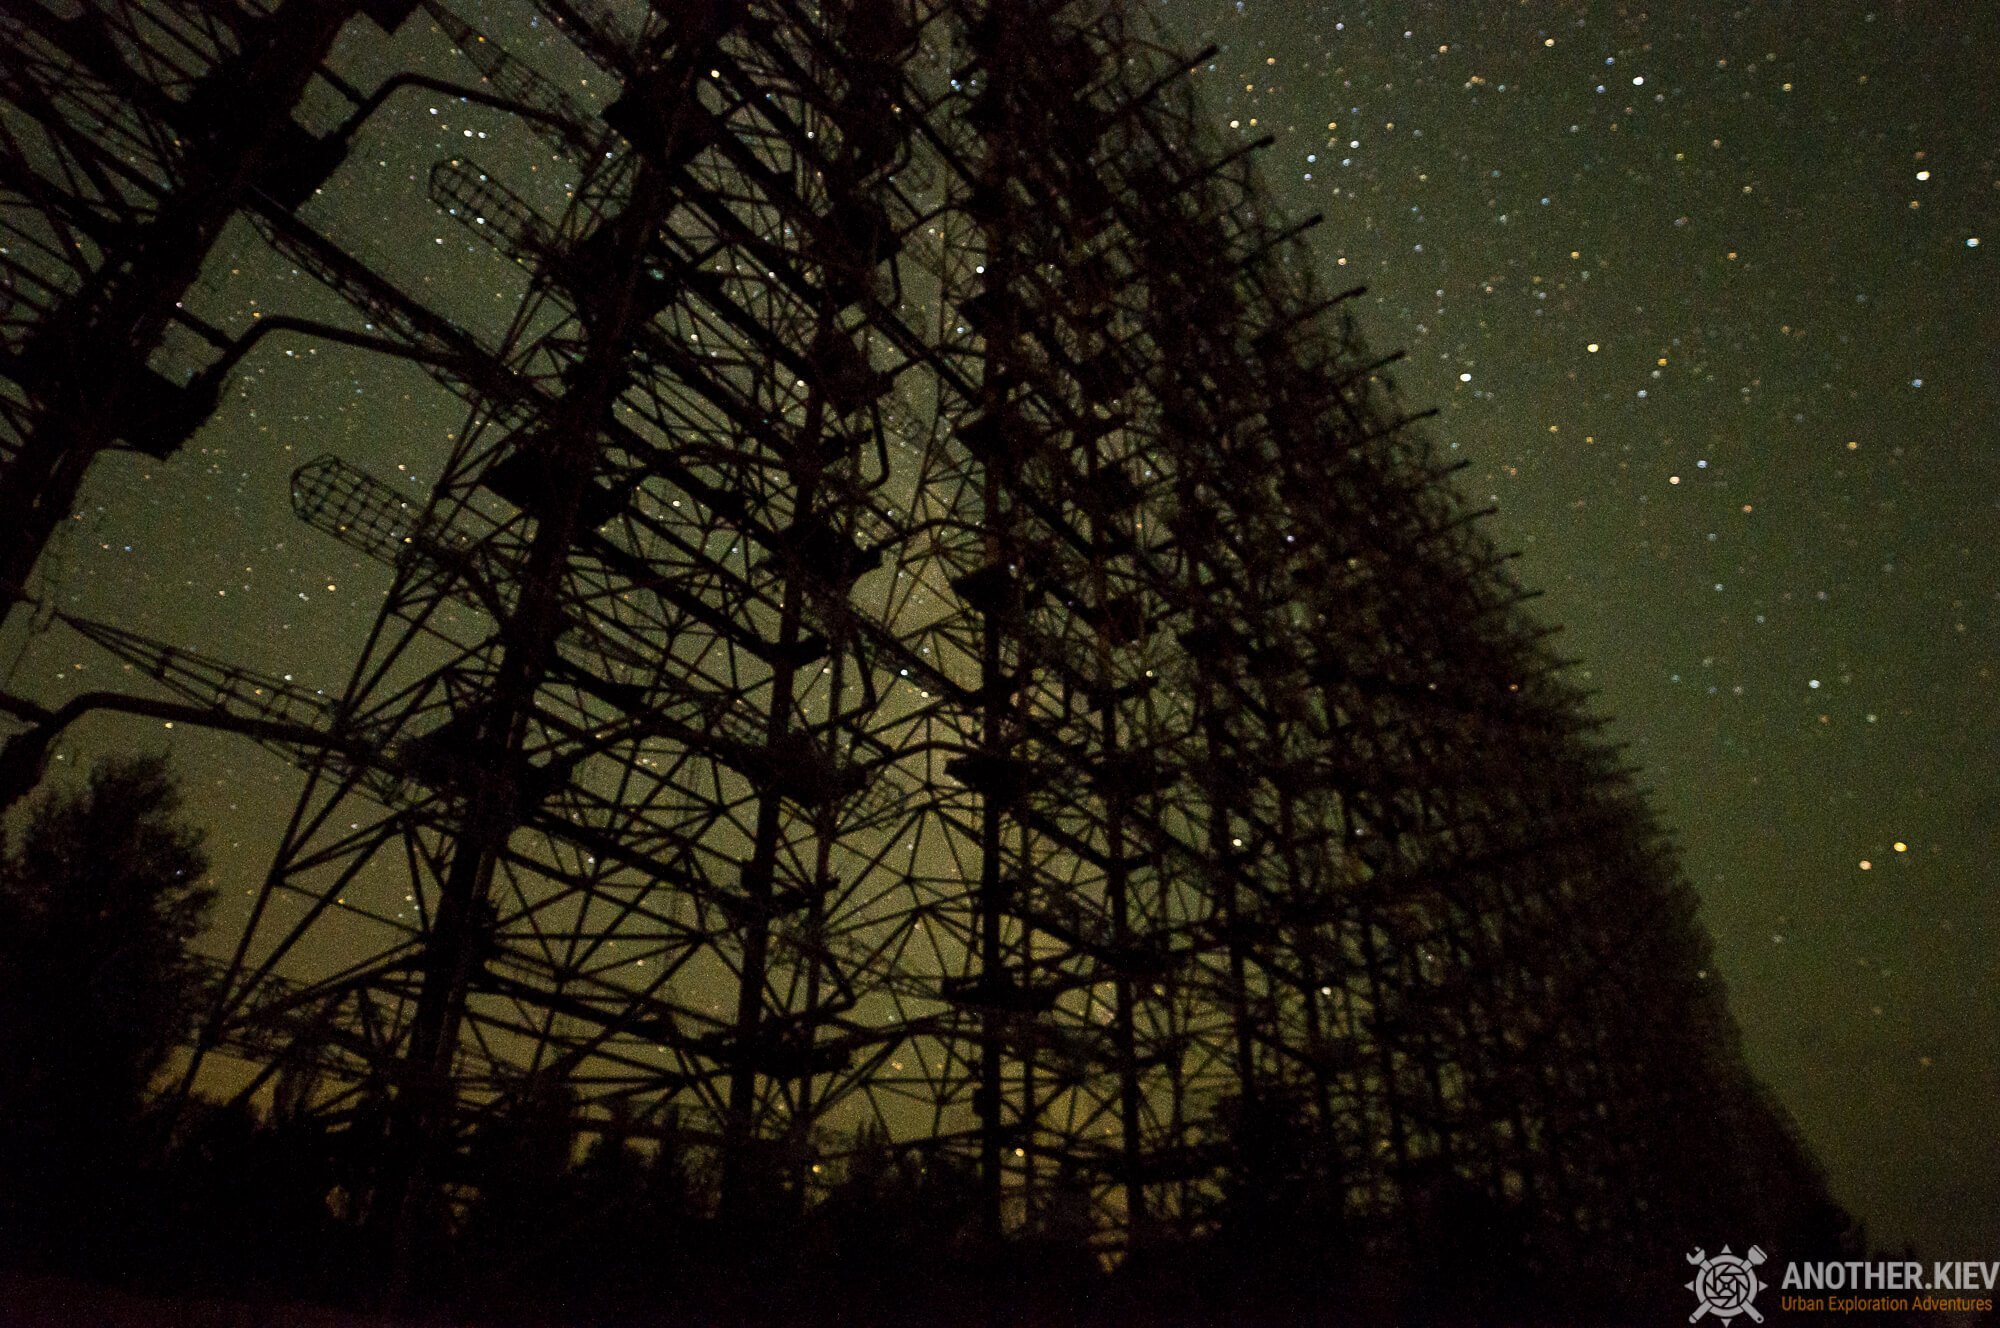 radar station duga-3 under millions of stars